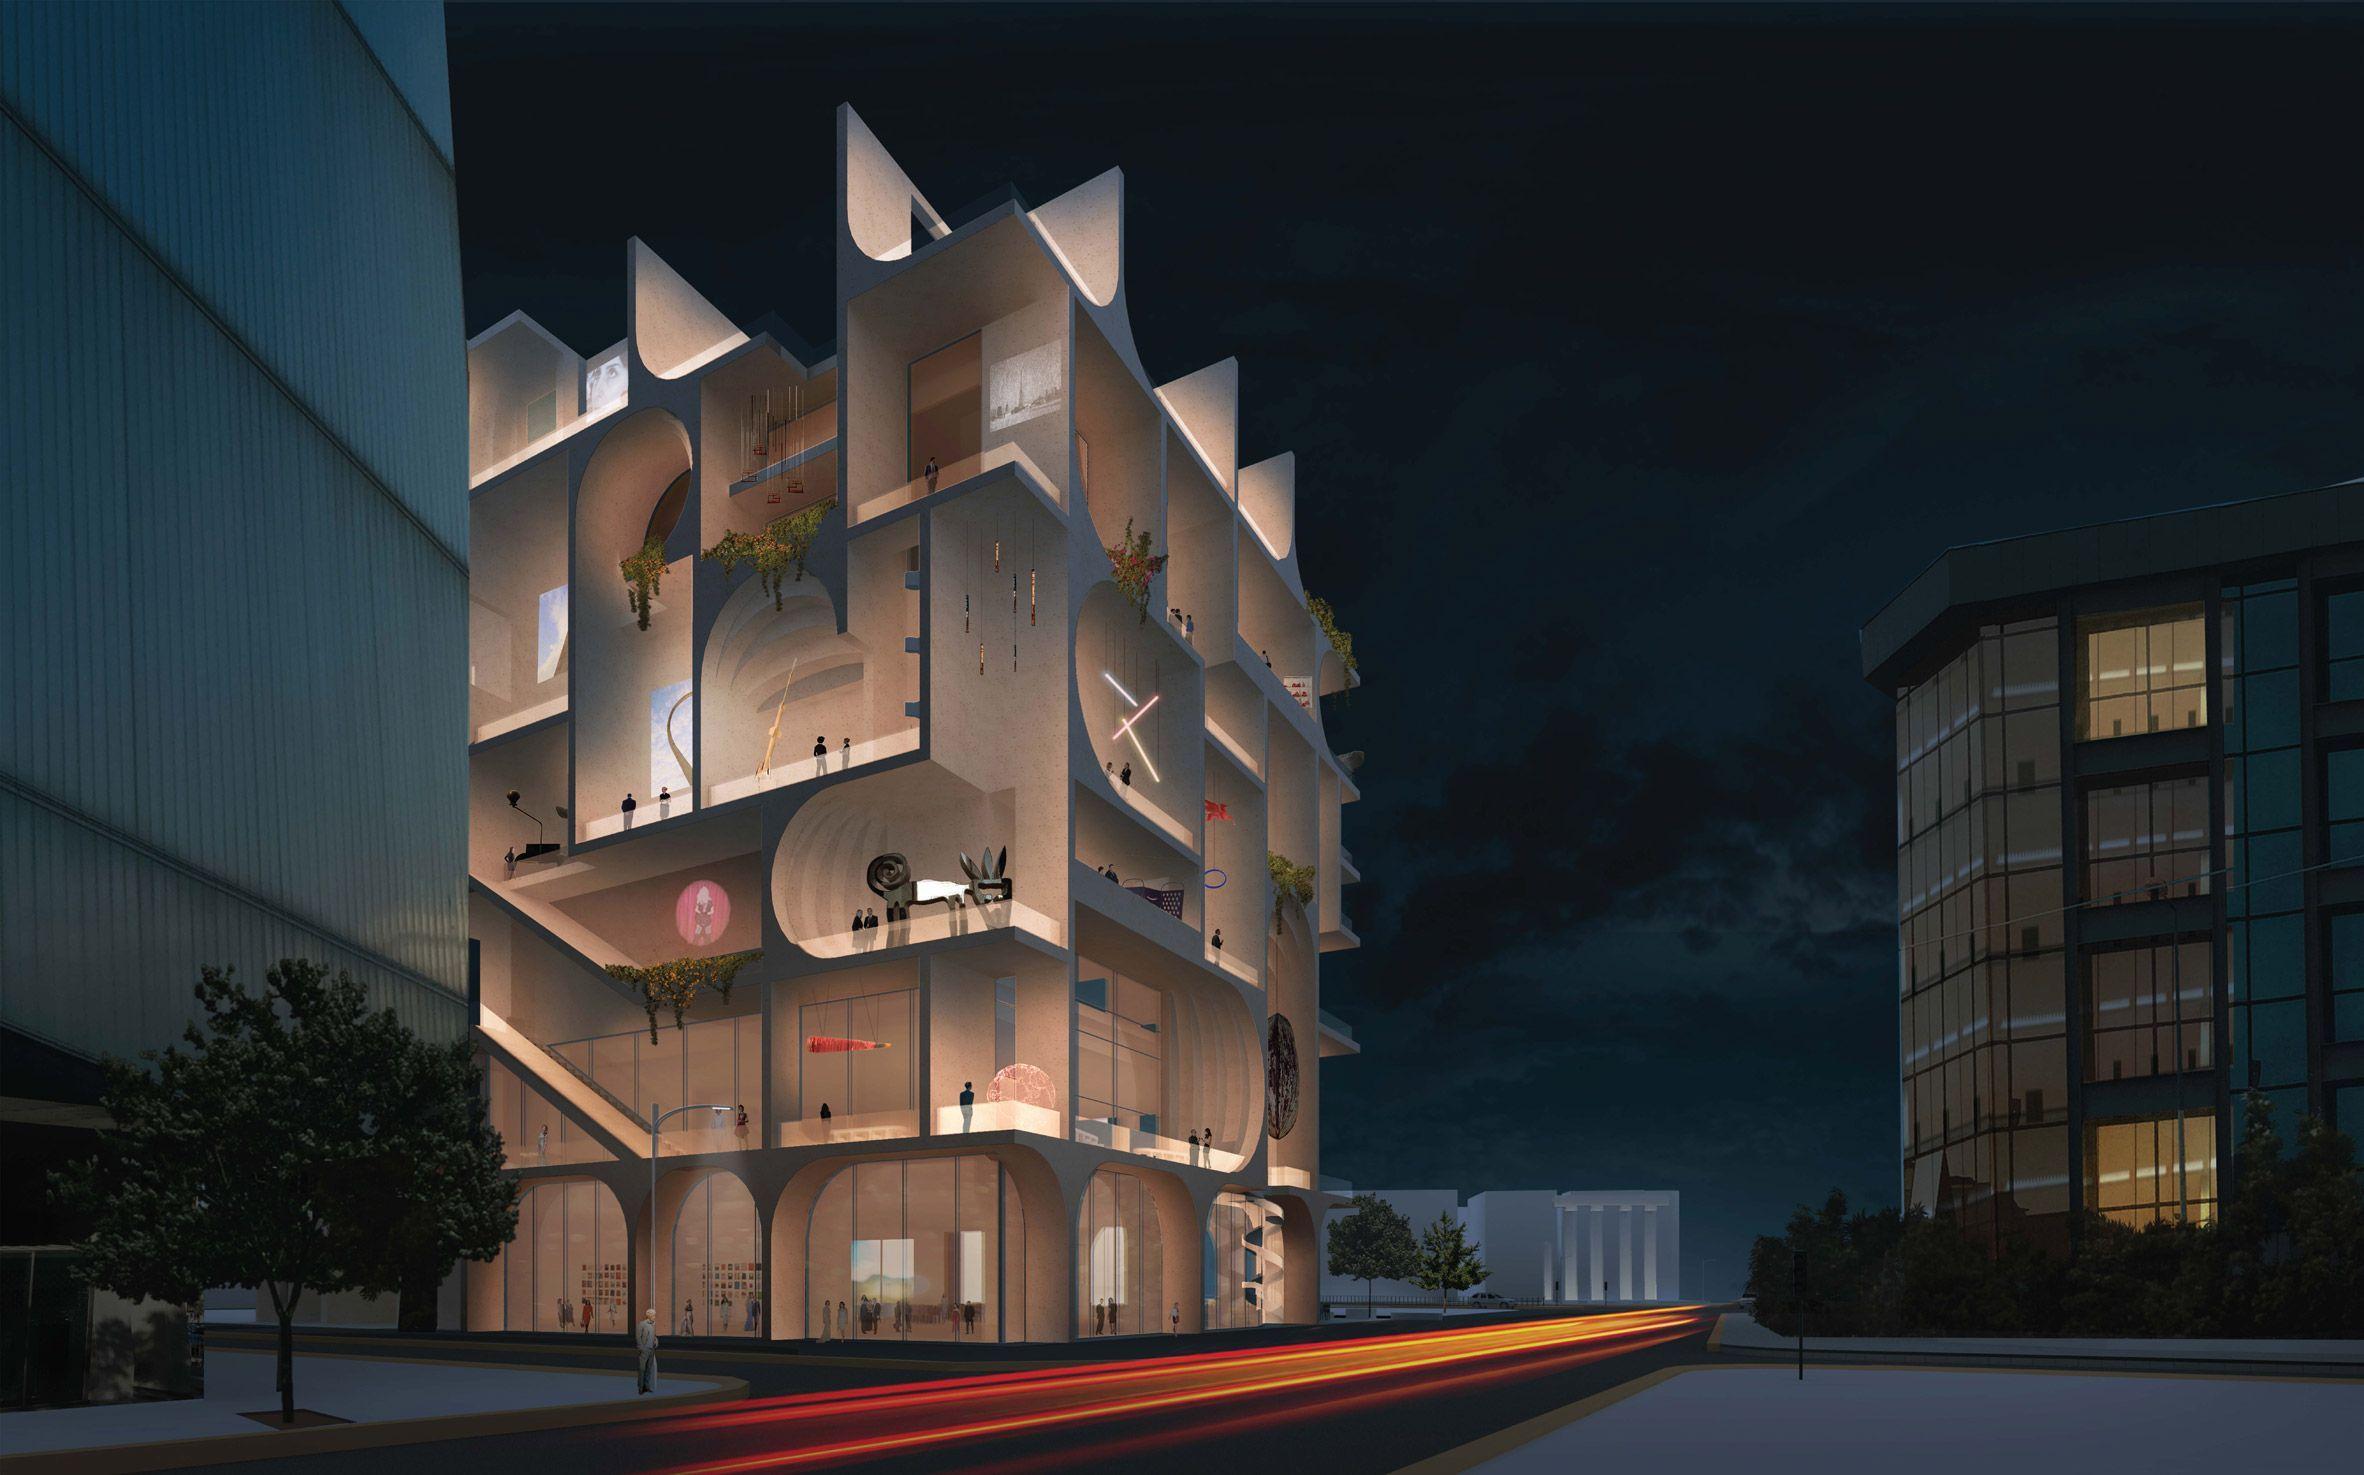 Architettura A Madrid passion of arquitecture arquitecture #arquitectura